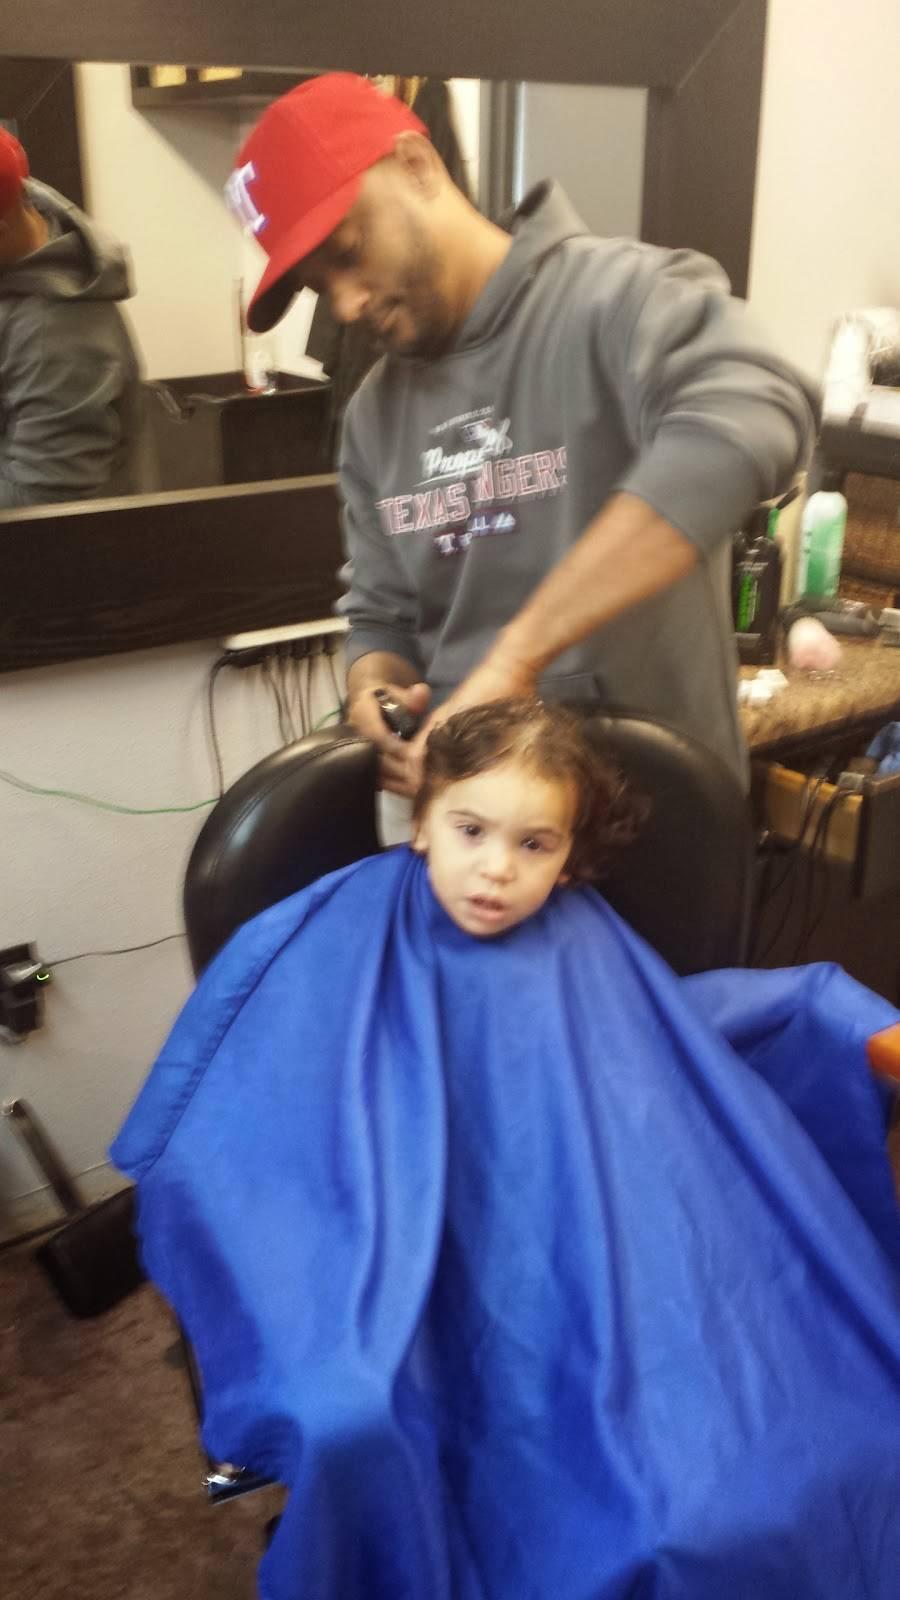 Xclusivo Cutz - hair care  | Photo 6 of 6 | Address: 2020 Mansfield Webb Rd, Arlington, TX 76002, USA | Phone: (817) 557-6448